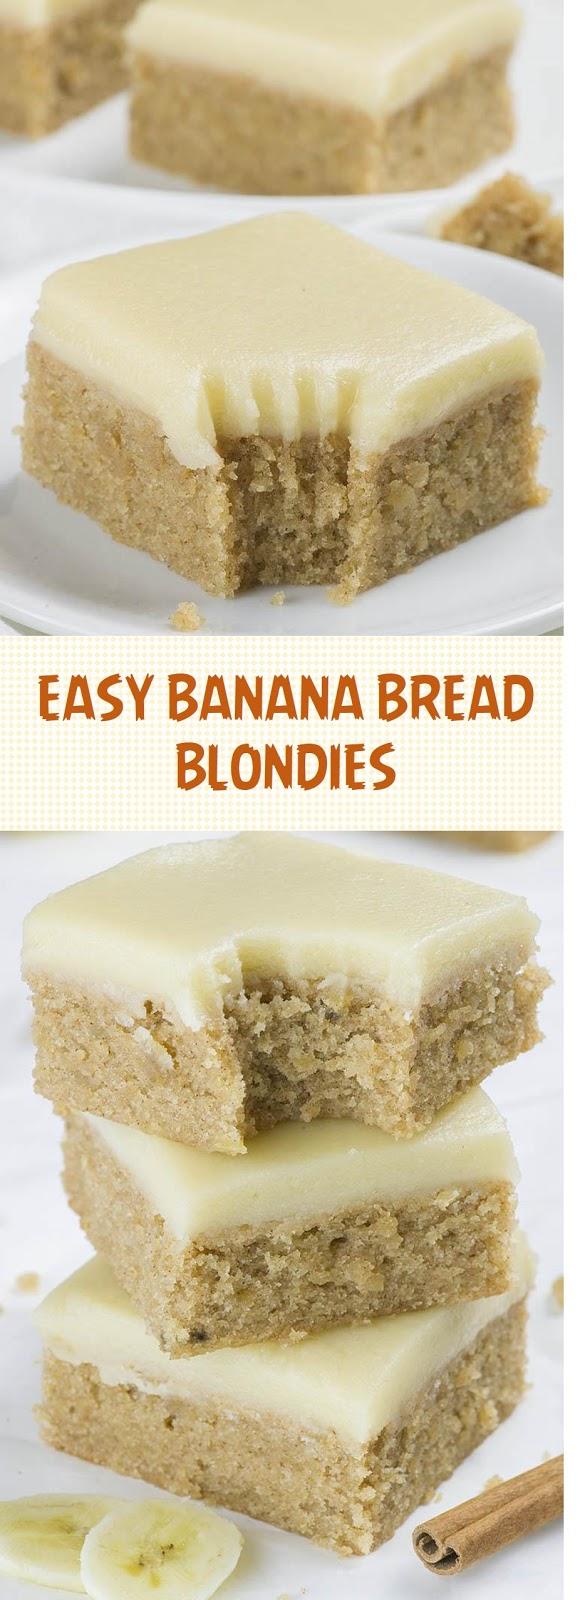 Easy Banana Bread Blondies